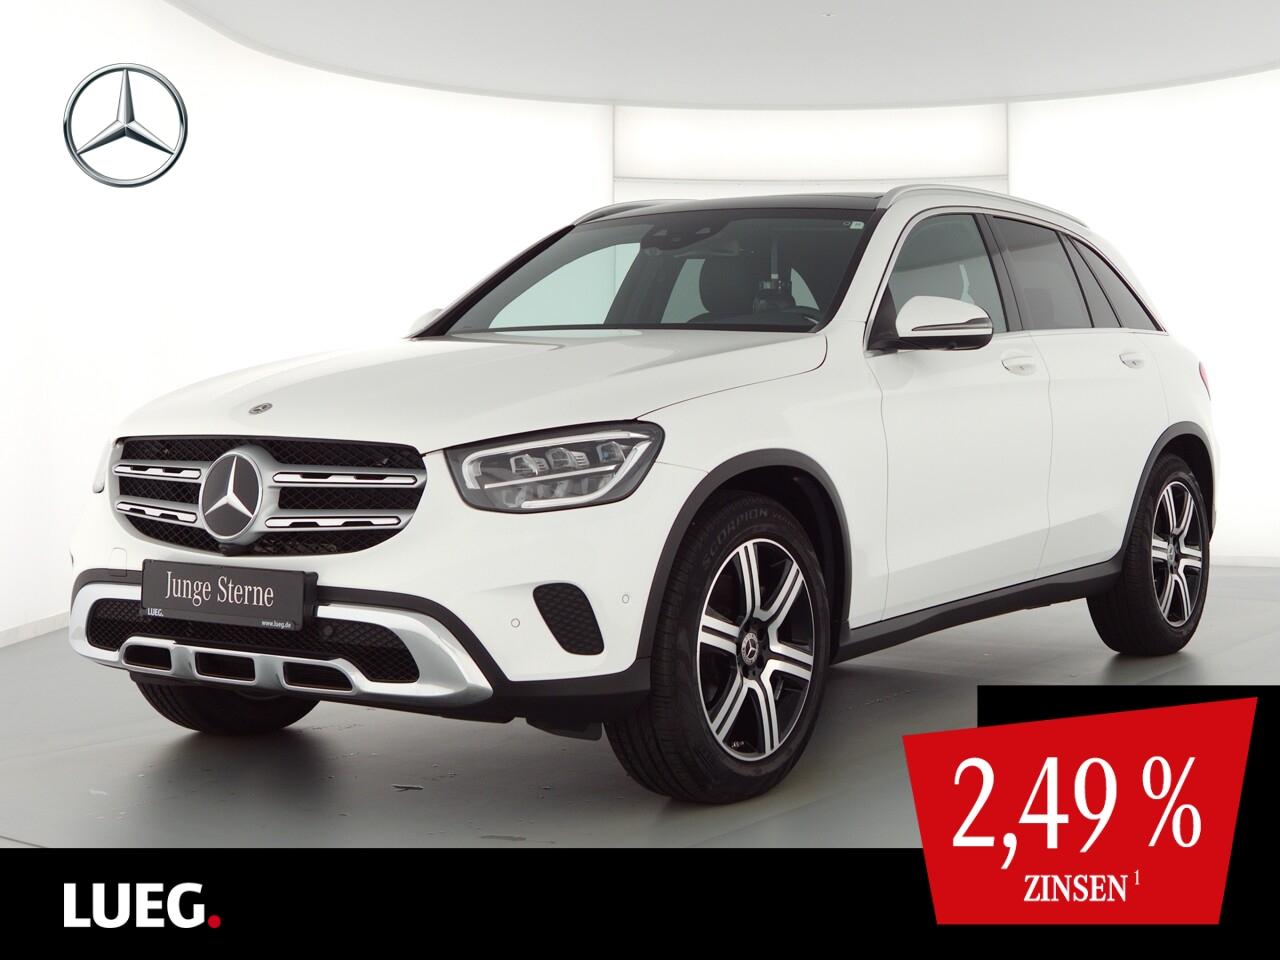 Mercedes-Benz GLC 300 4M MBUX+Pano+LED-HP+Sthzg+19''+Distr+360, Jahr 2020, Benzin